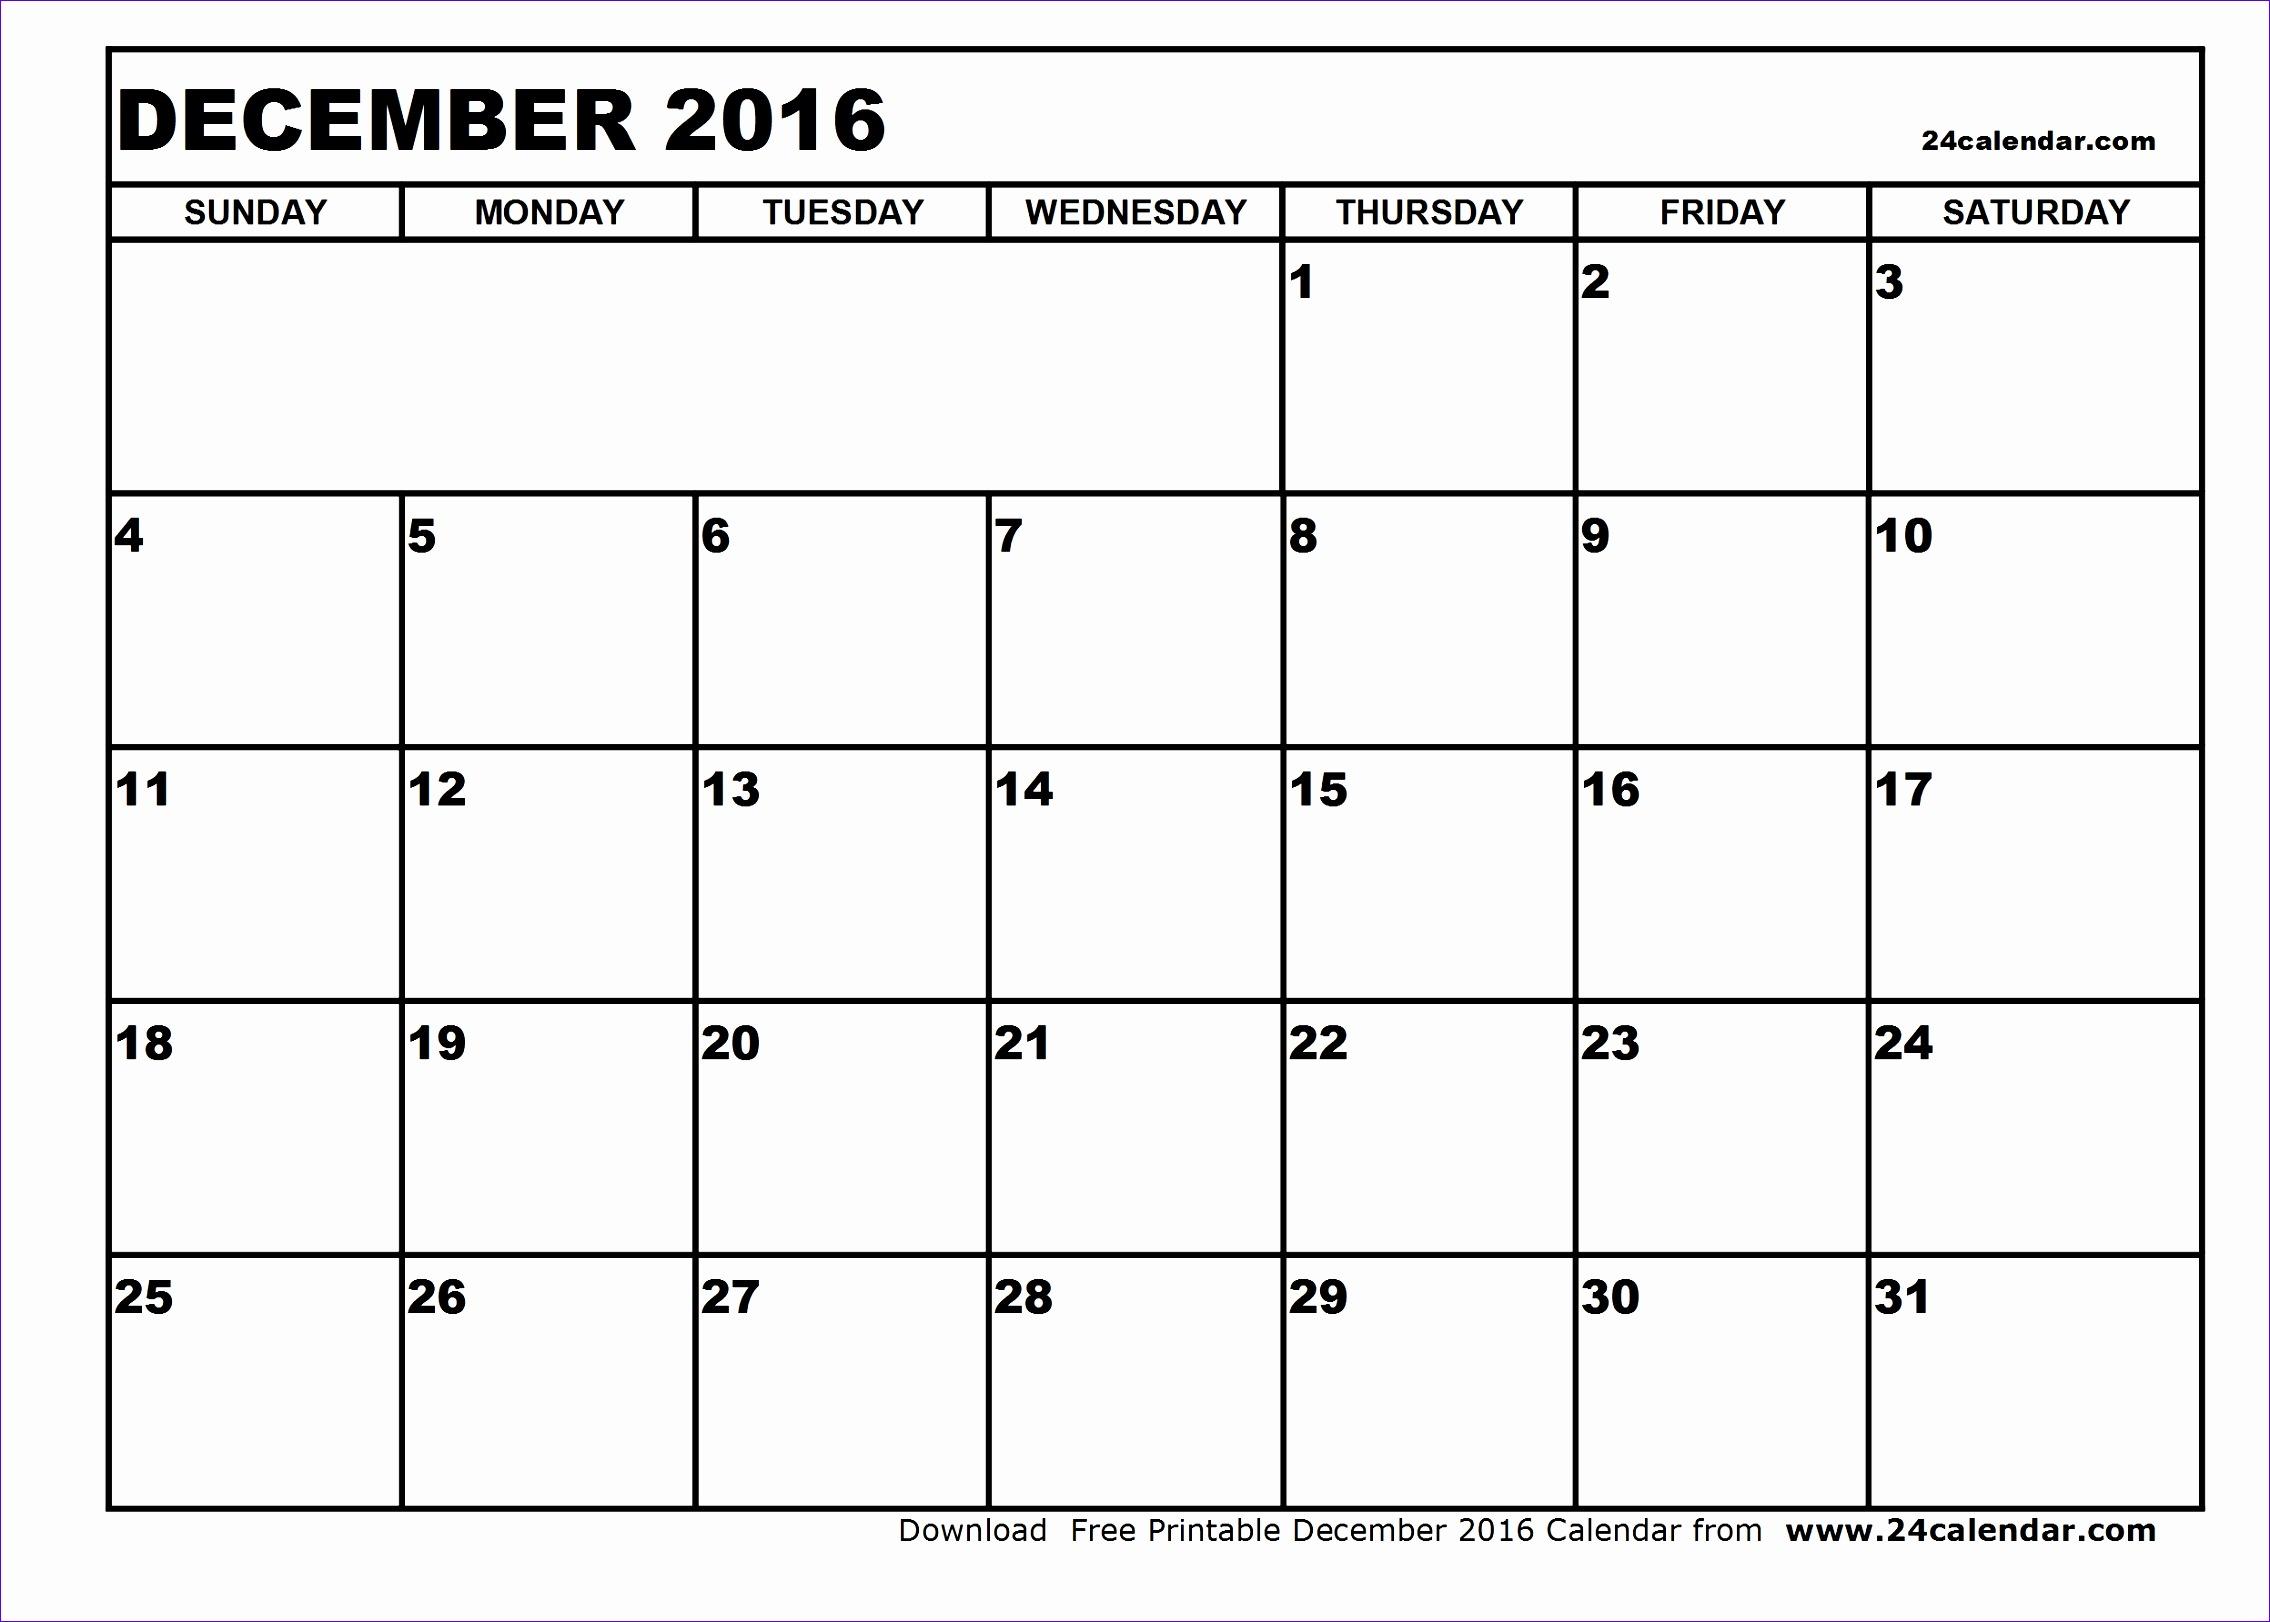 december 2016 calendar printable 1981